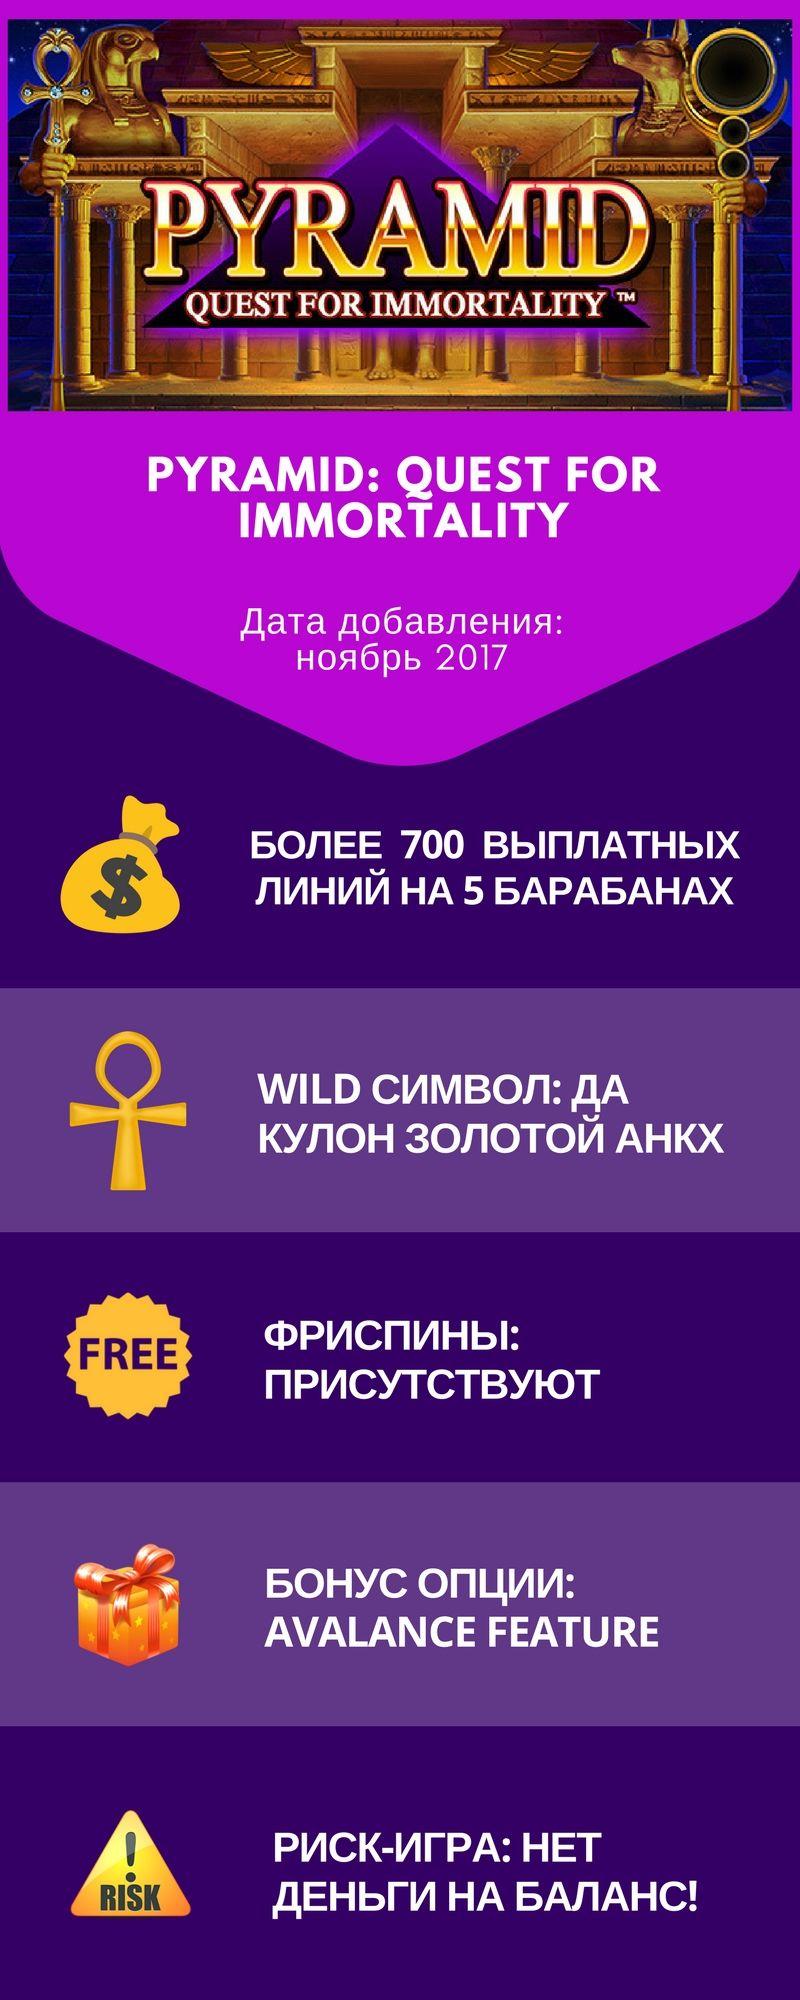 PARTHENON: QUEST FOR IMMORTALITY ИГРОВОЙ АВТОМАТ